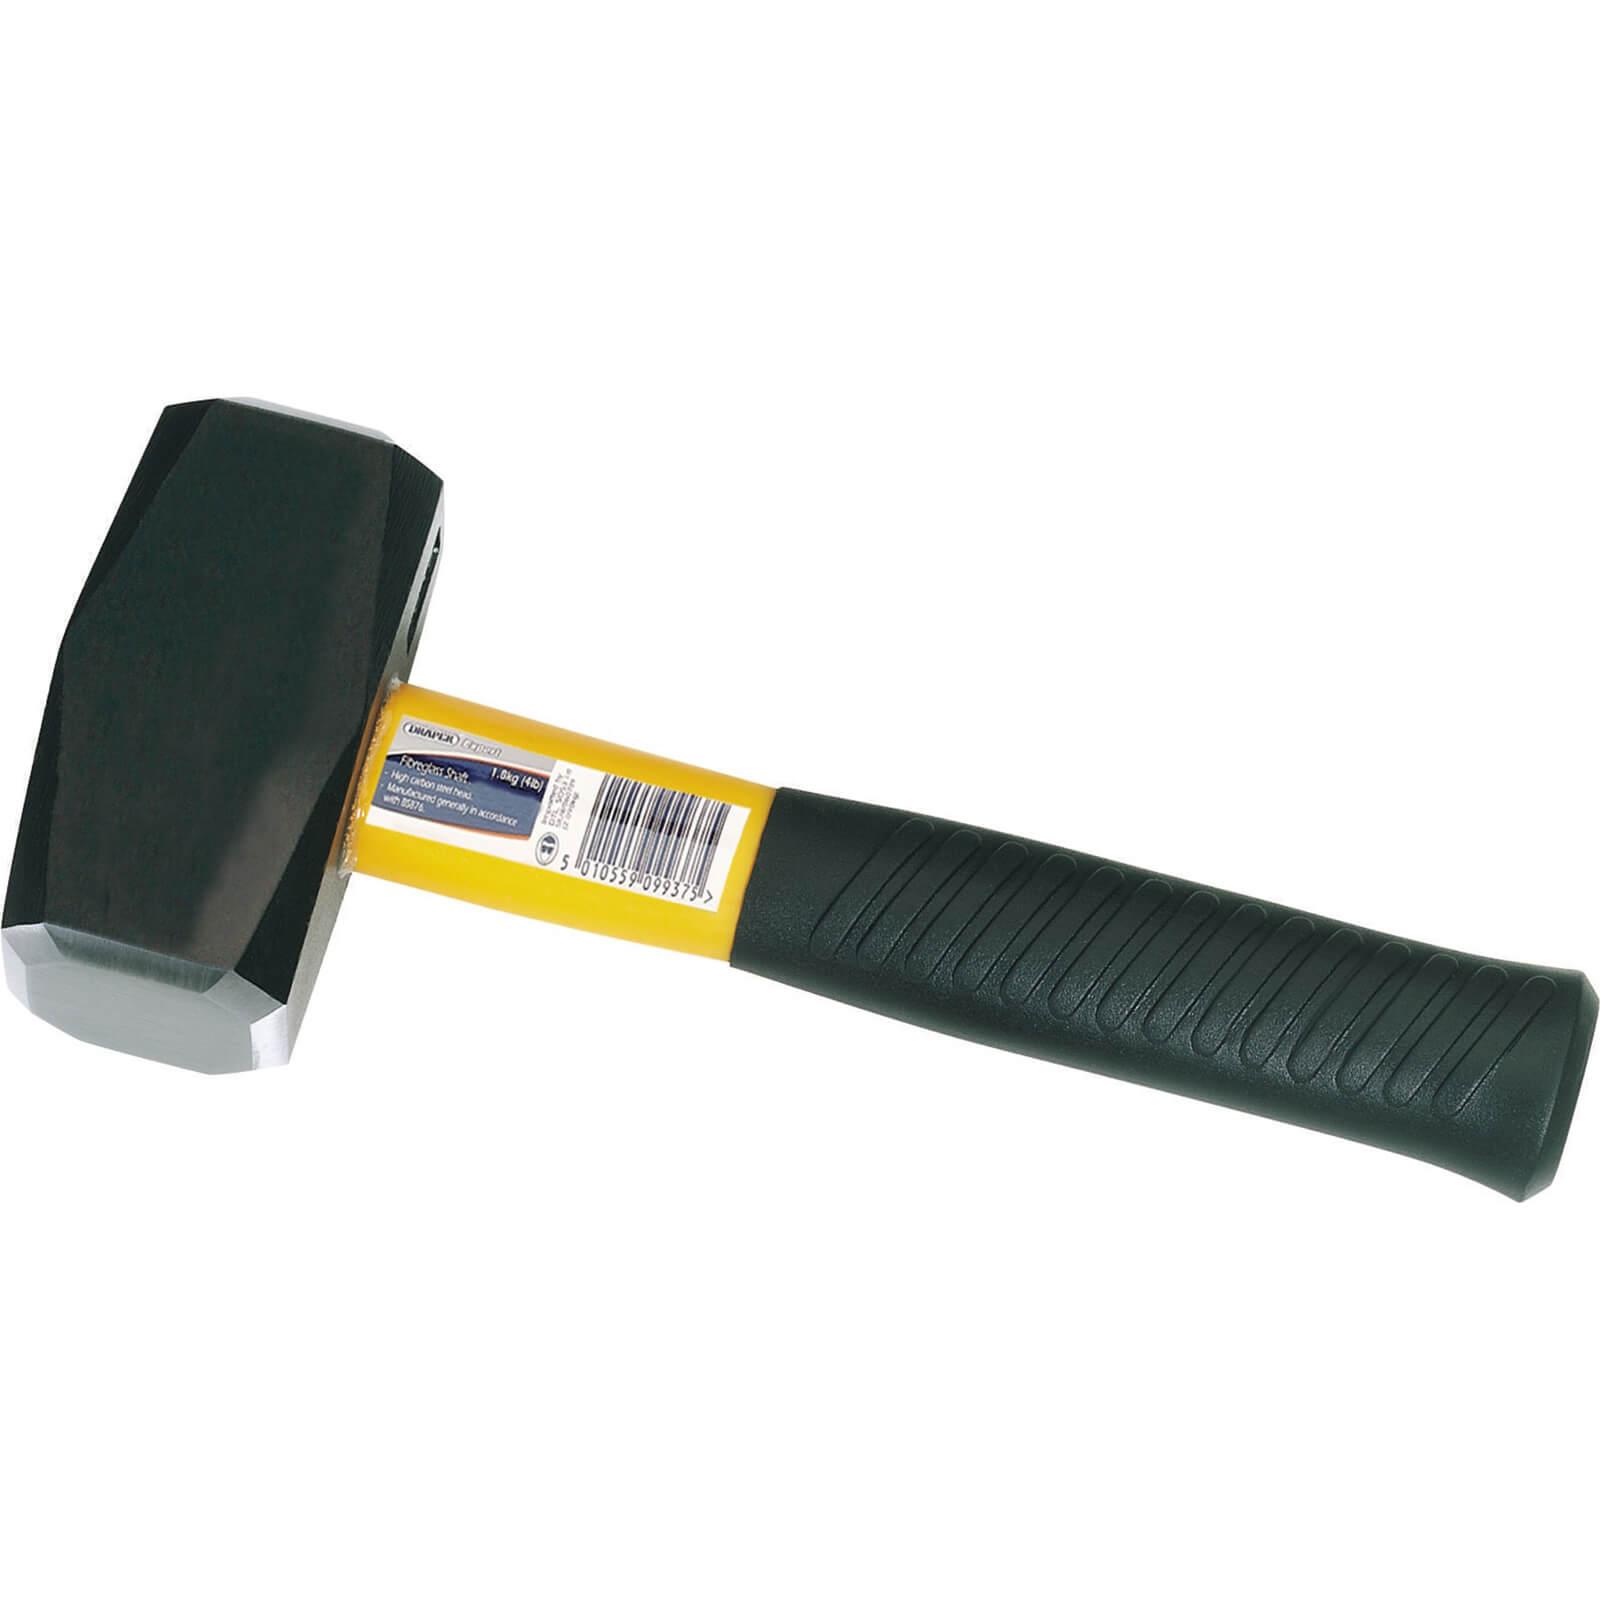 Draper Expert Club Hammer 1.8kg